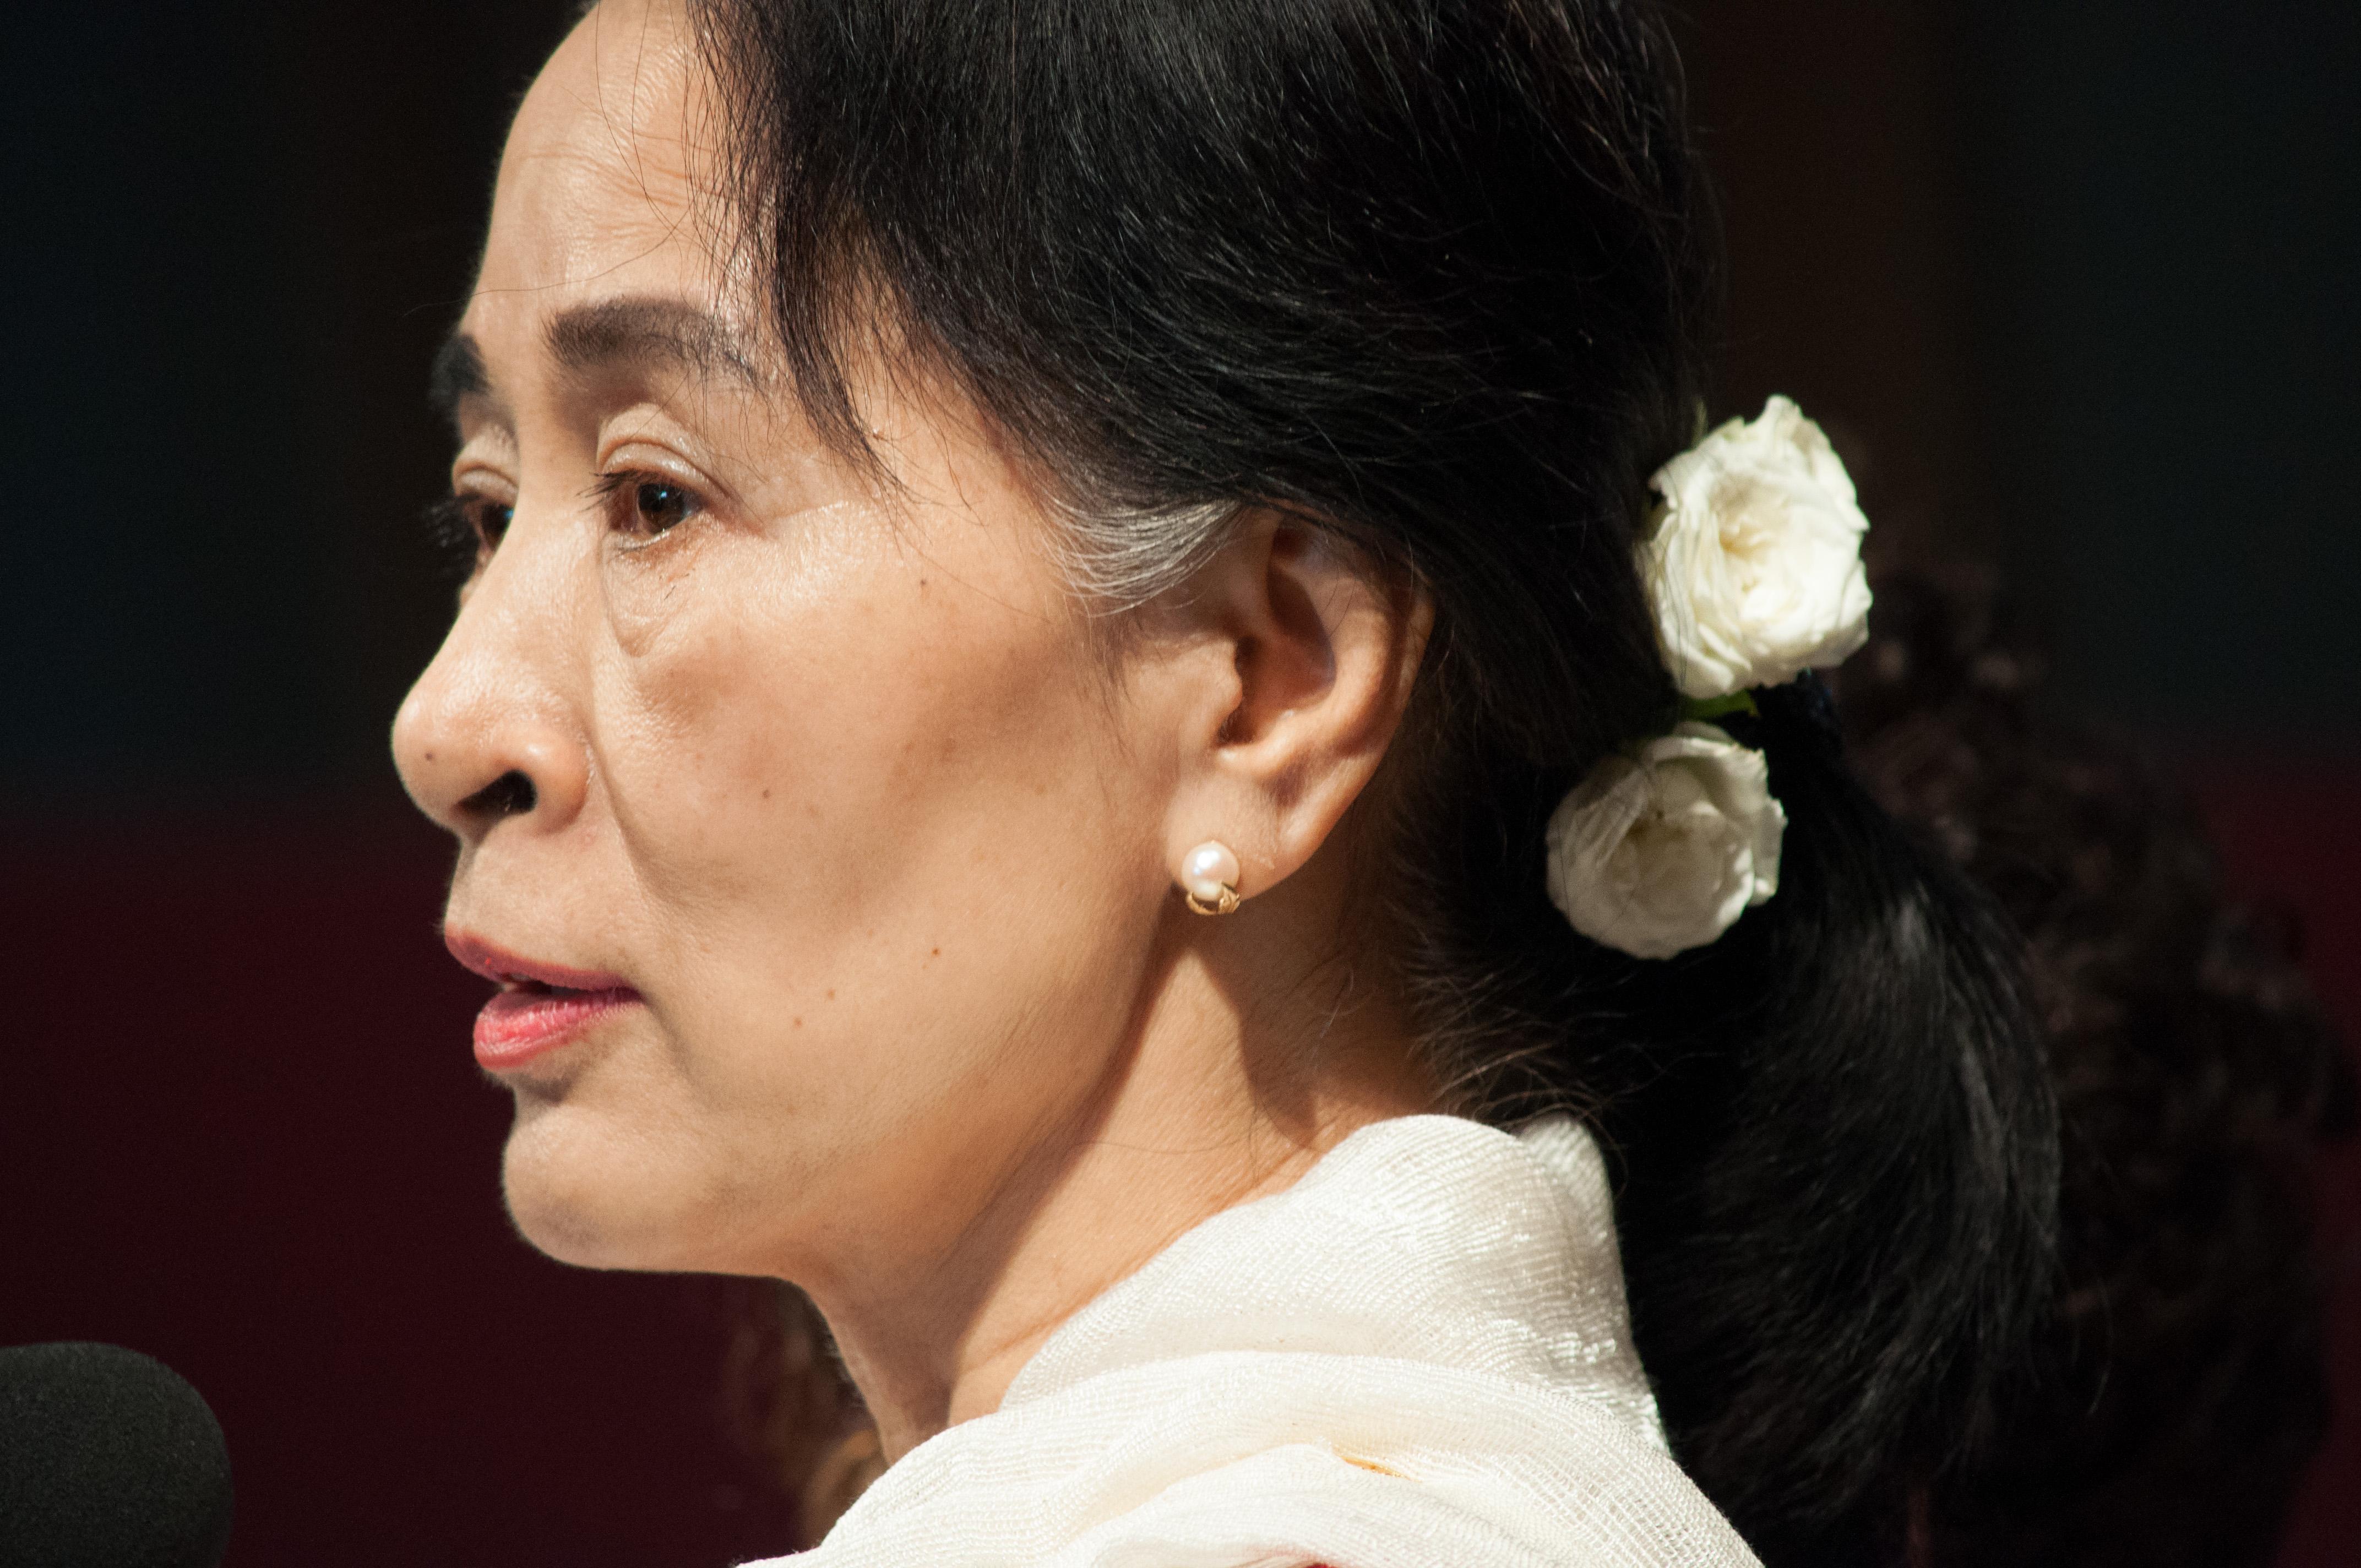 File:Aung San Suu Kyi 31 ott 13 050.jpg - Wikimedia Commons